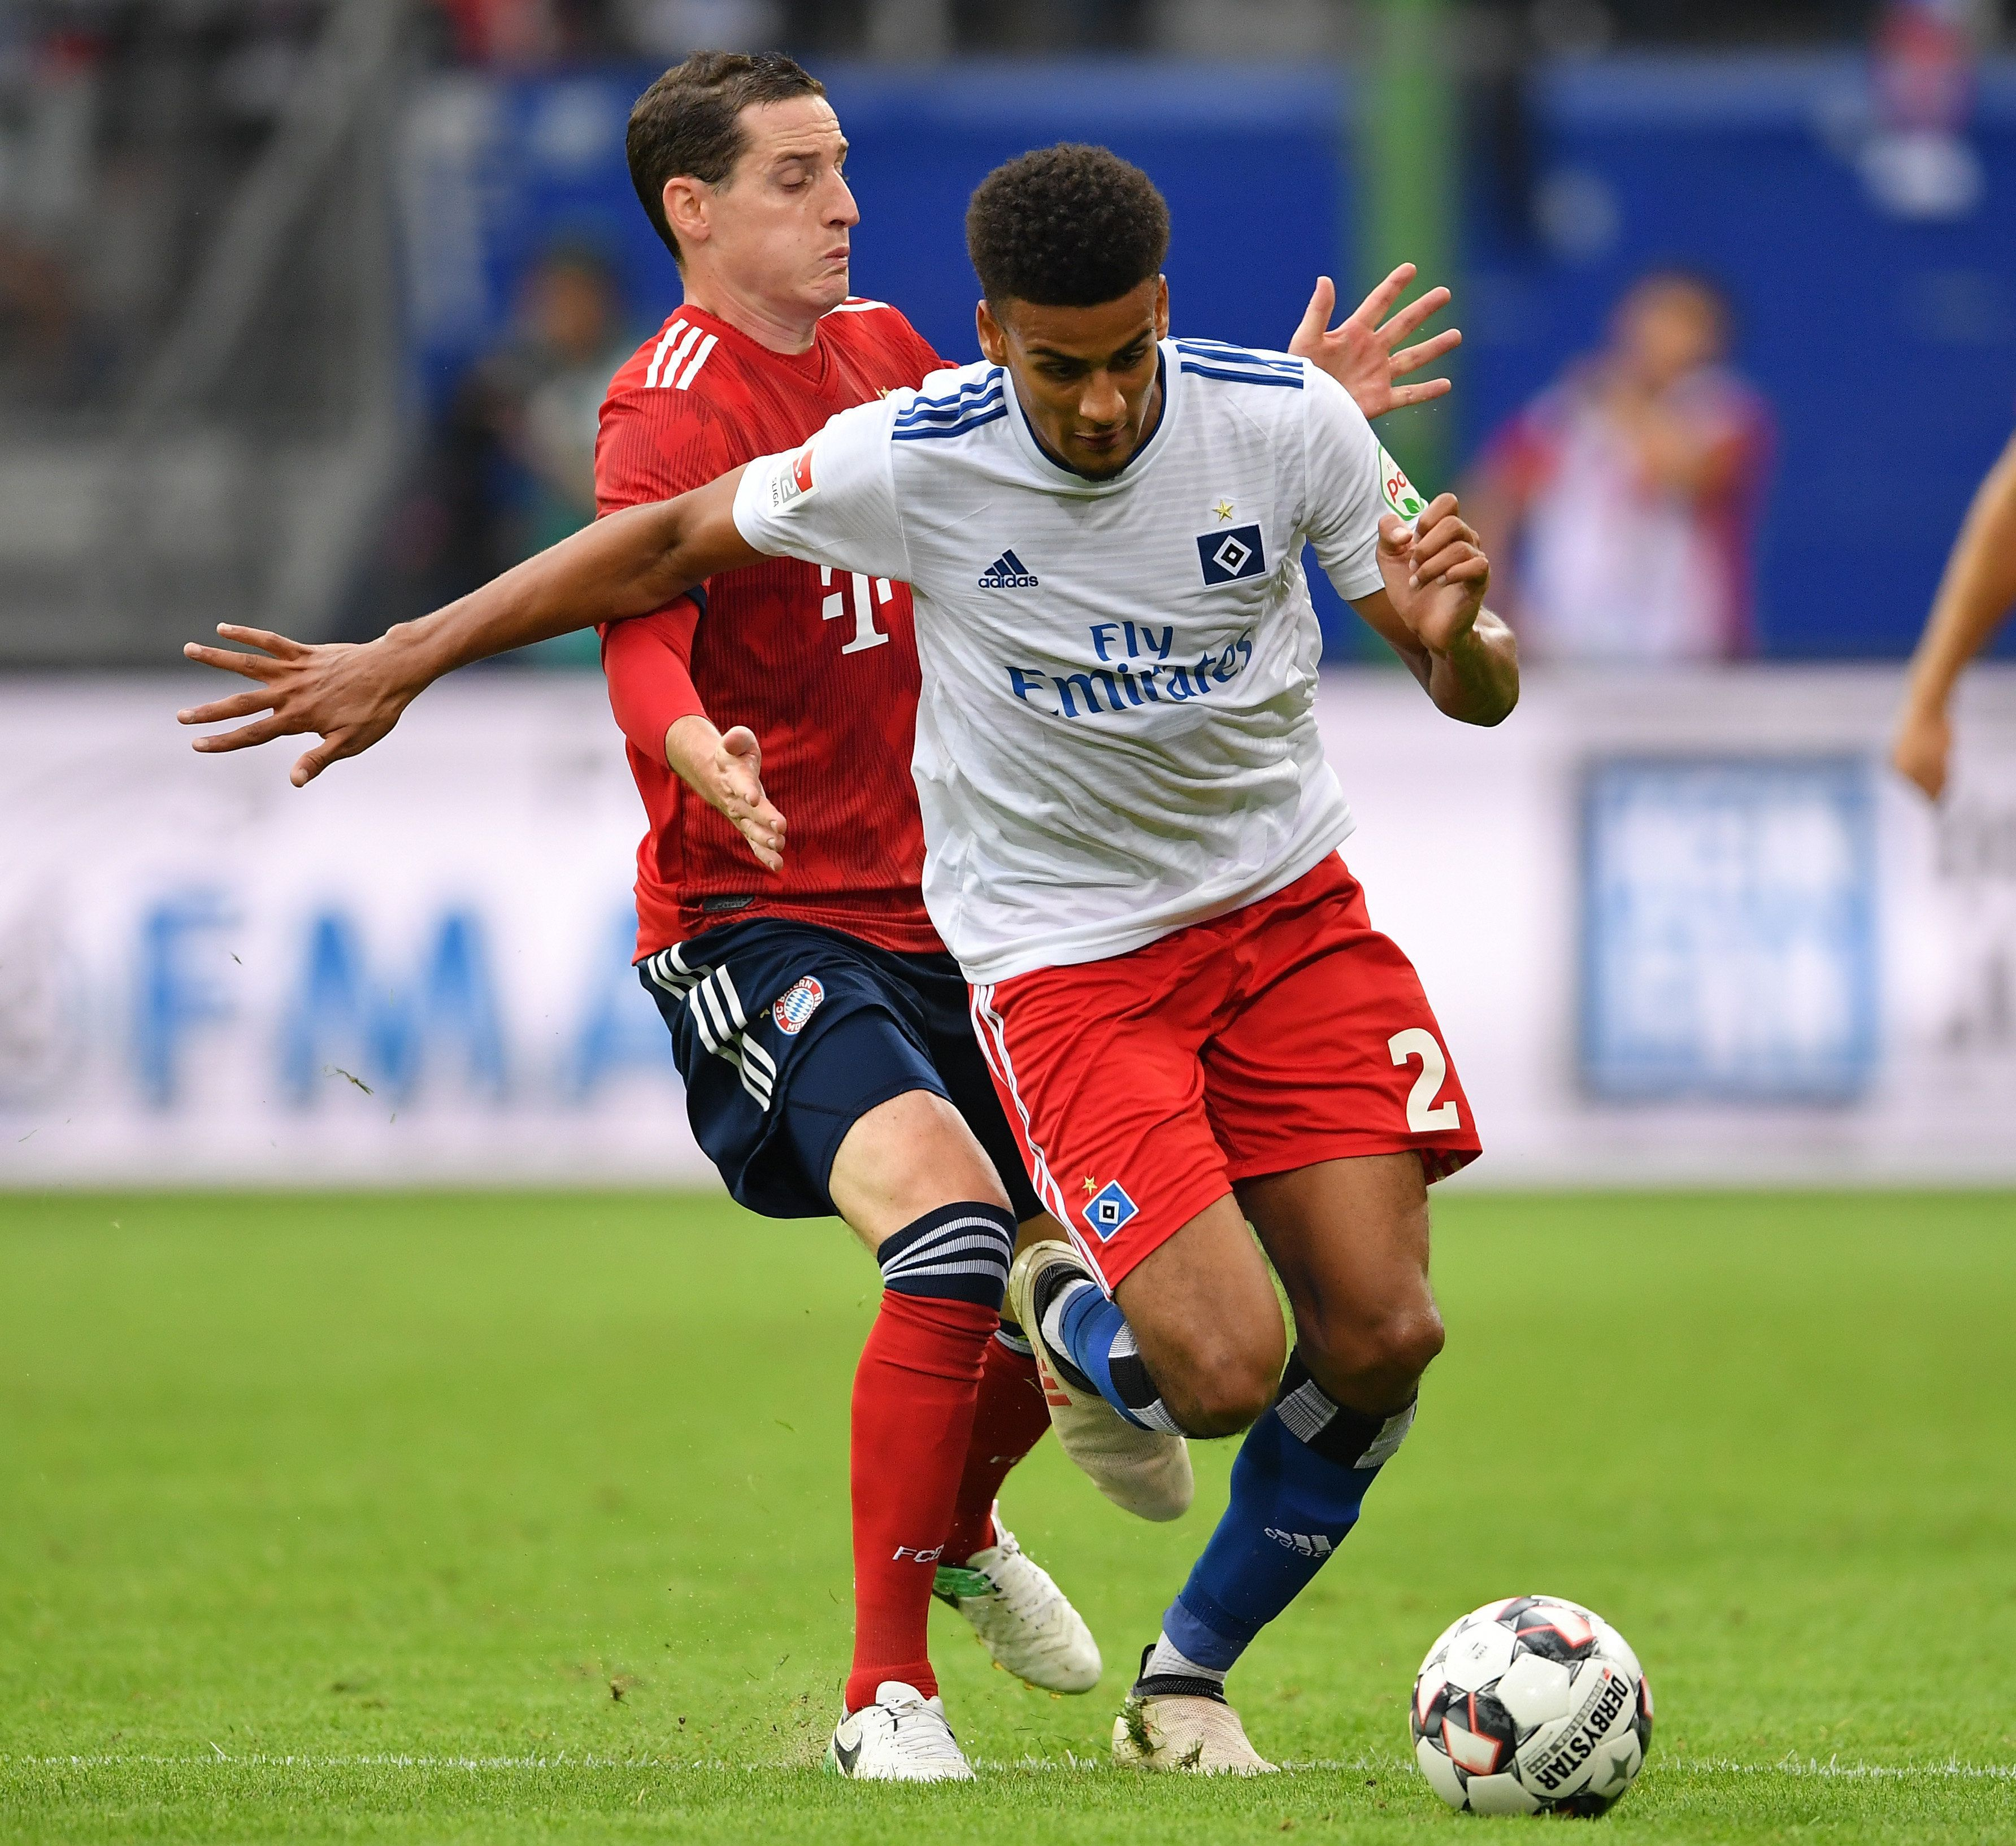 DFB-Pokal im Live-Stream: TuS Erndtebrück – Hamburger SV online